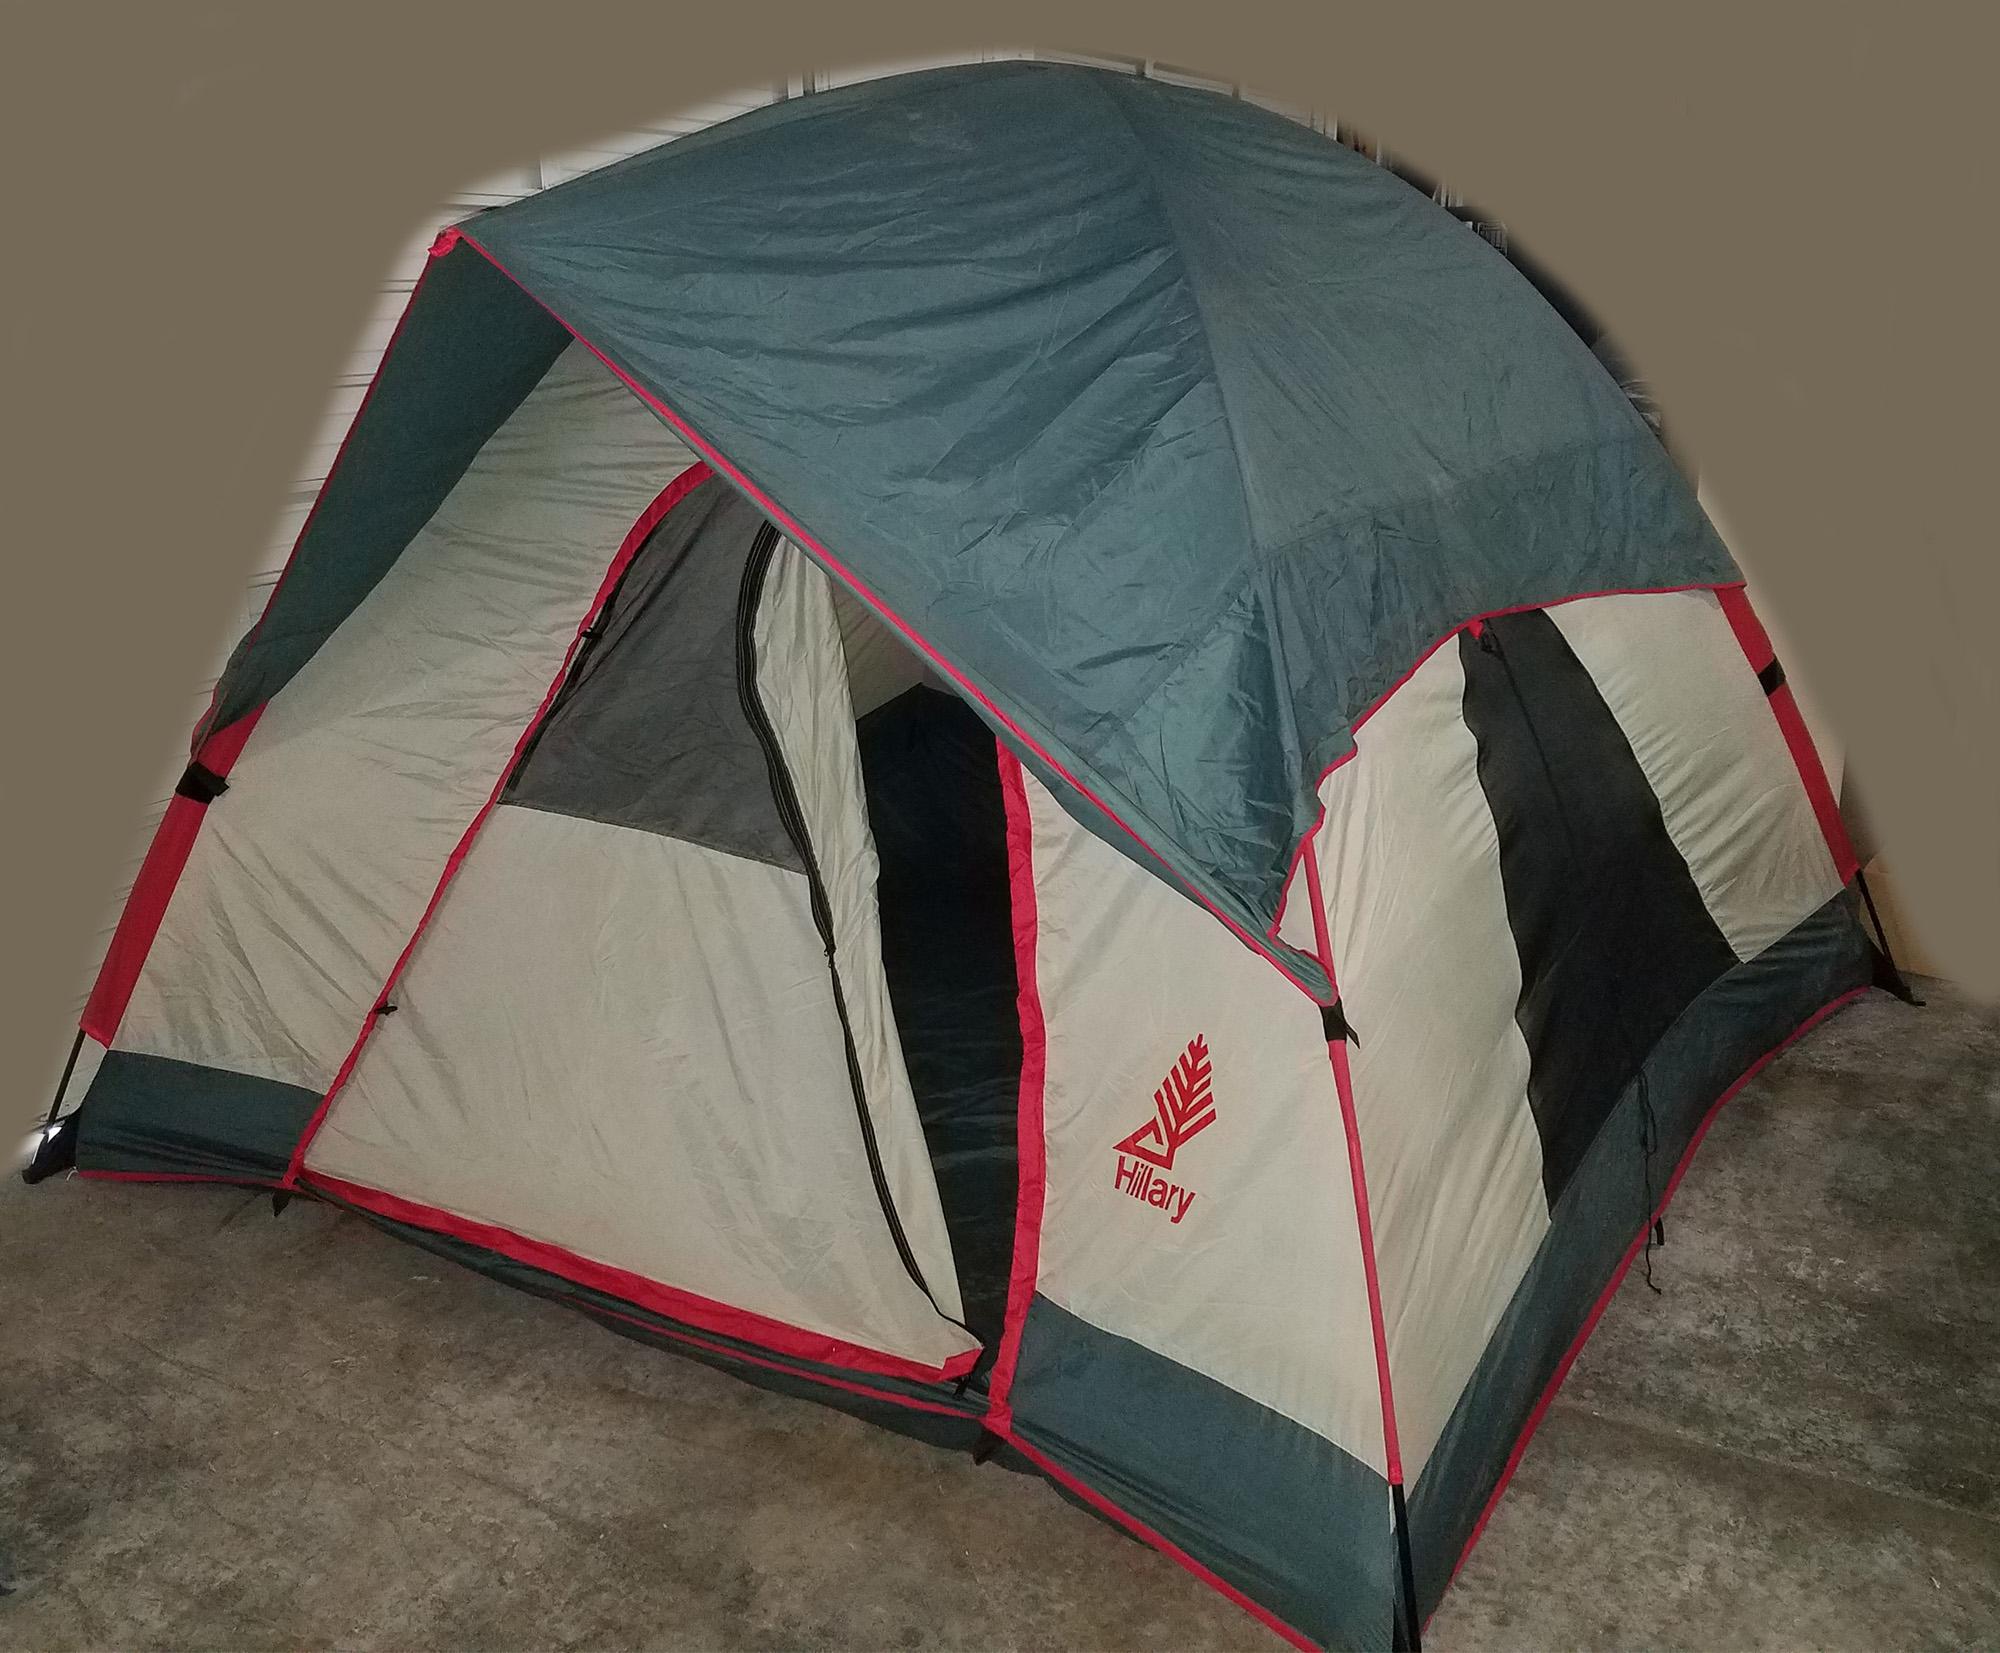 4-Person Tent